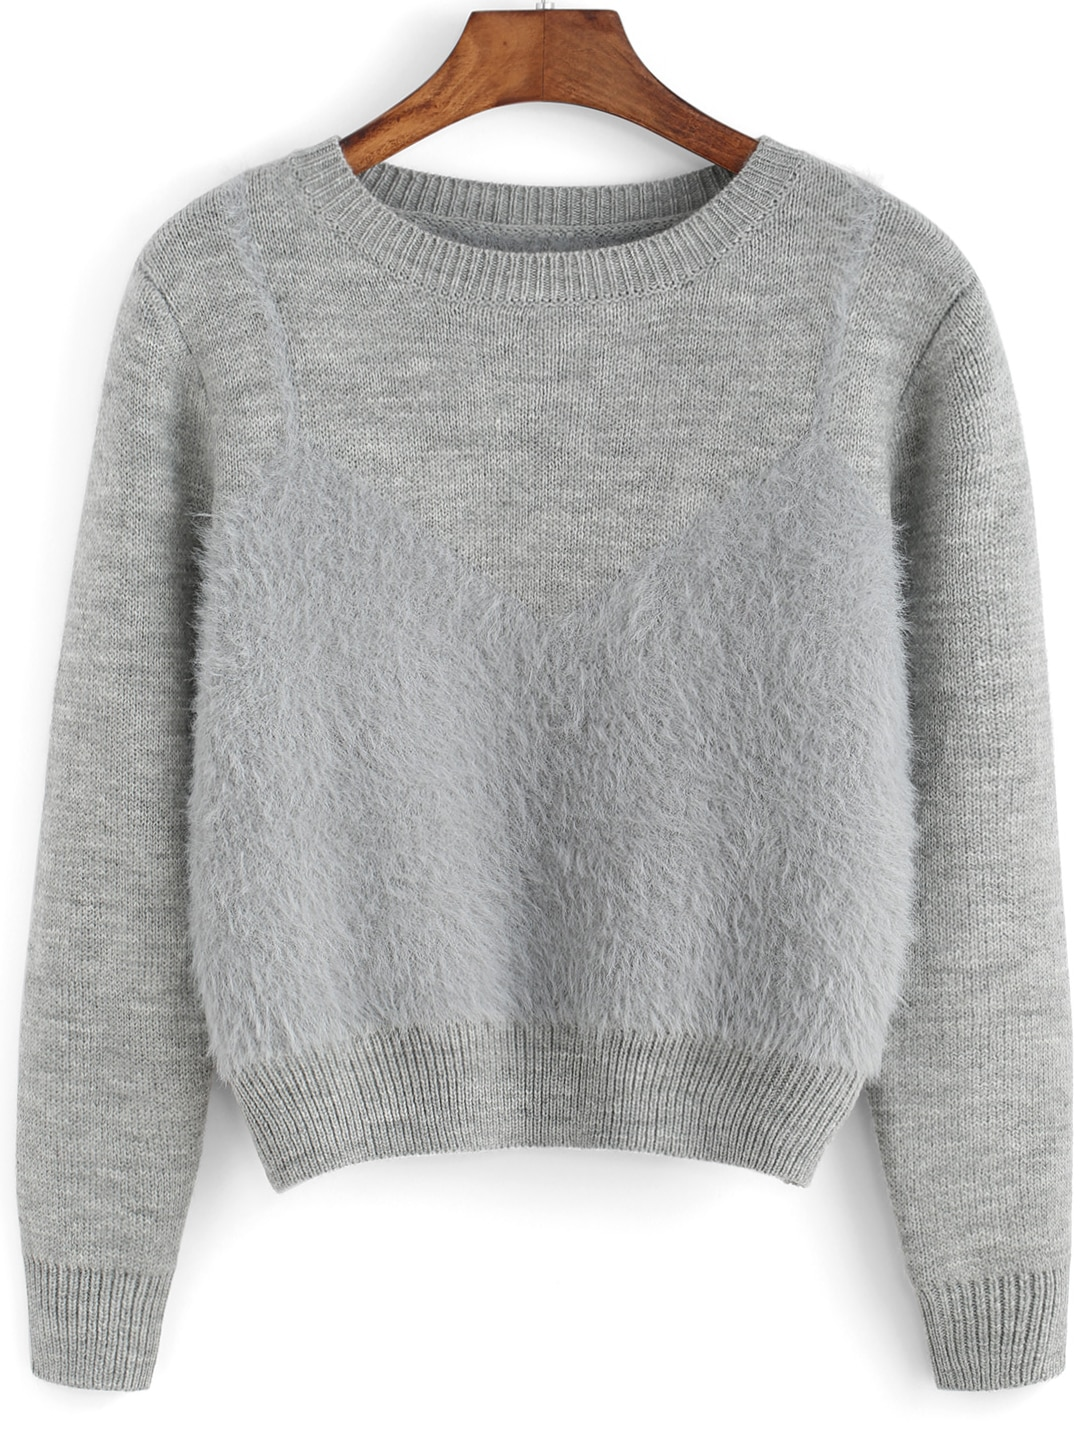 Knitting Sweaters In The Round : Grey round neck crop knit sweater shein sheinside